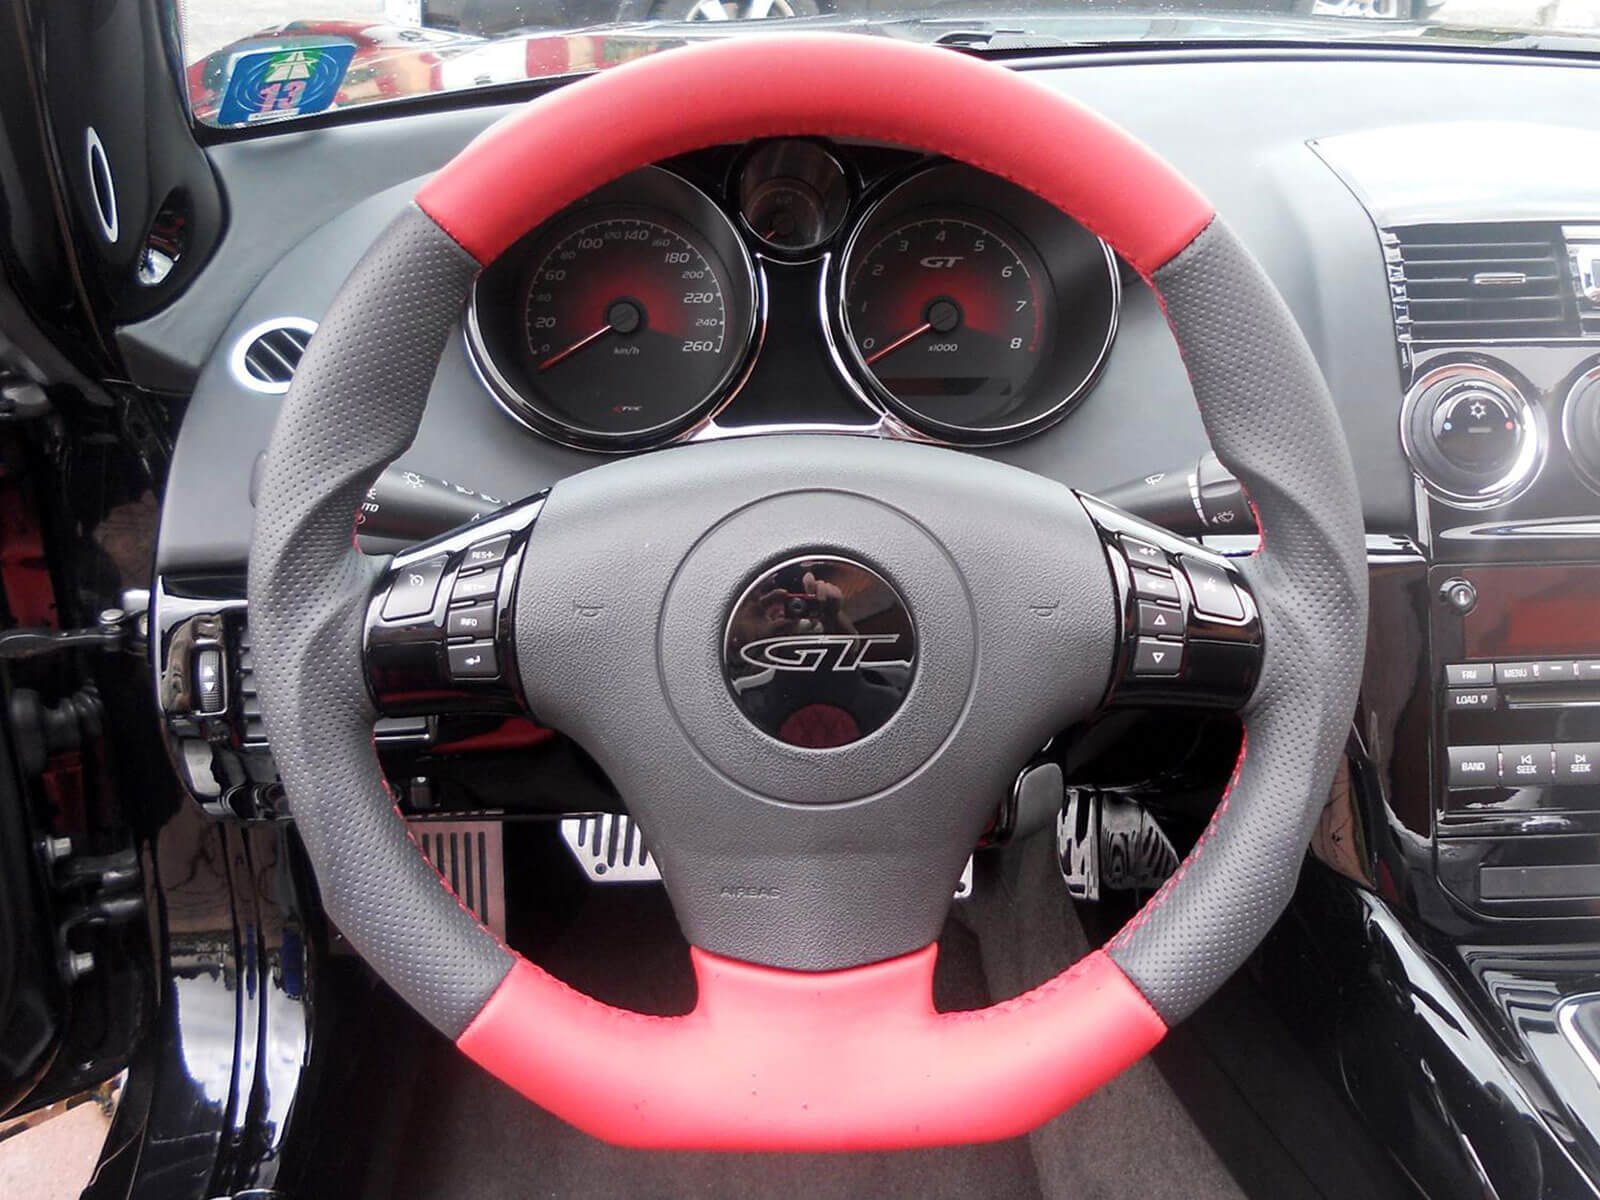 Kreis Tuning - Sportlenkrad in Leder in der Farbe Rot-Schwarzer